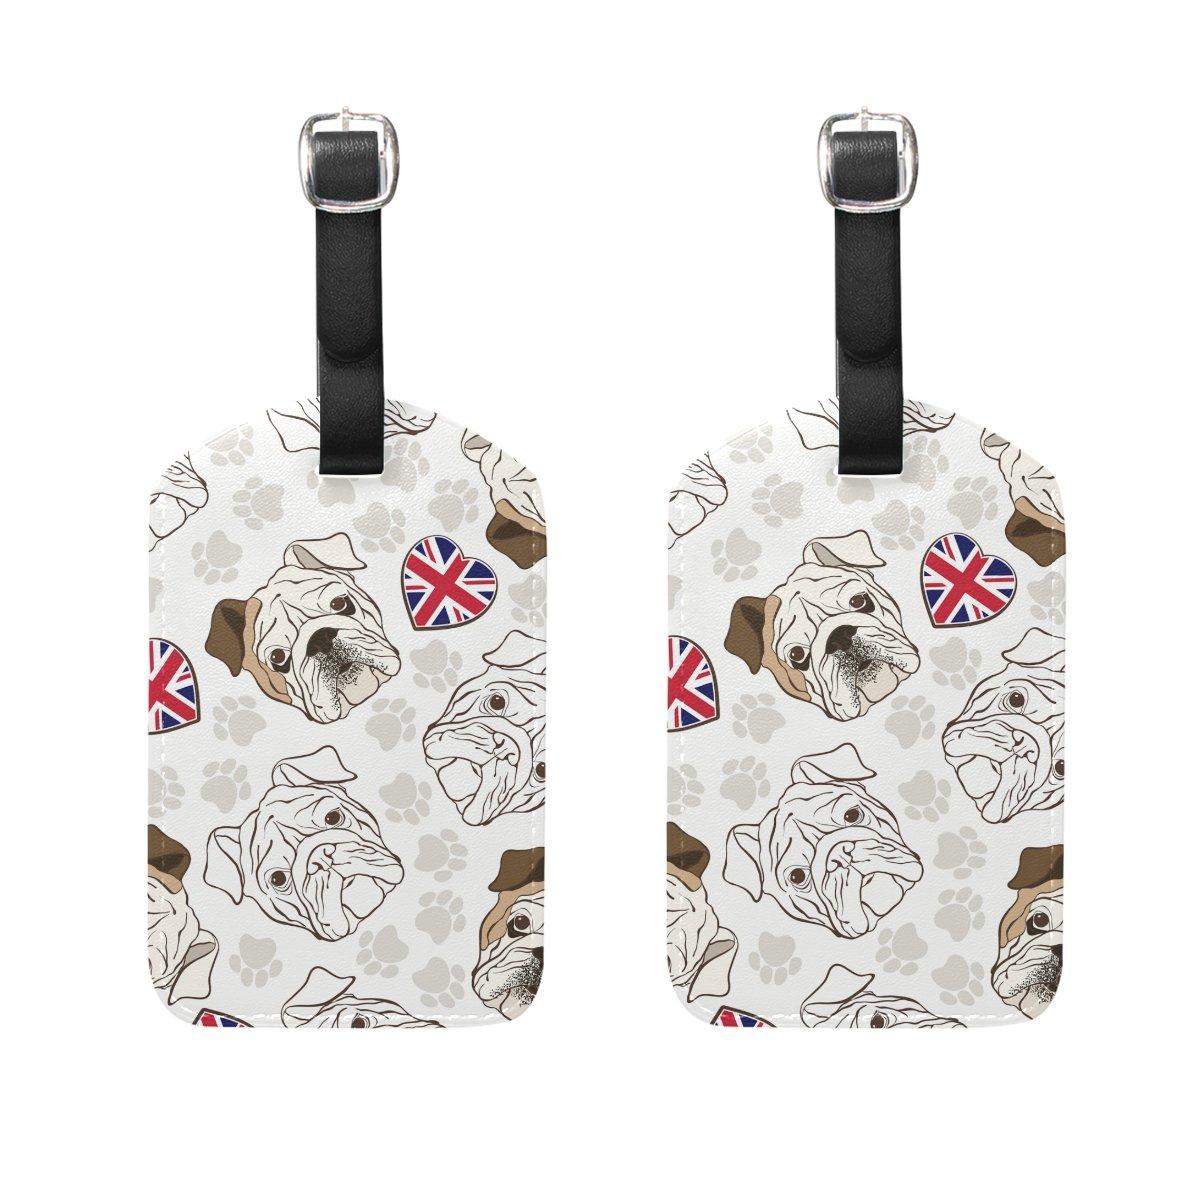 COOSUN English Bulldog Luggage Tags Travel Labels Tag Name Card Holder for Baggage Suitcase Bag Backpacks 2 PCS